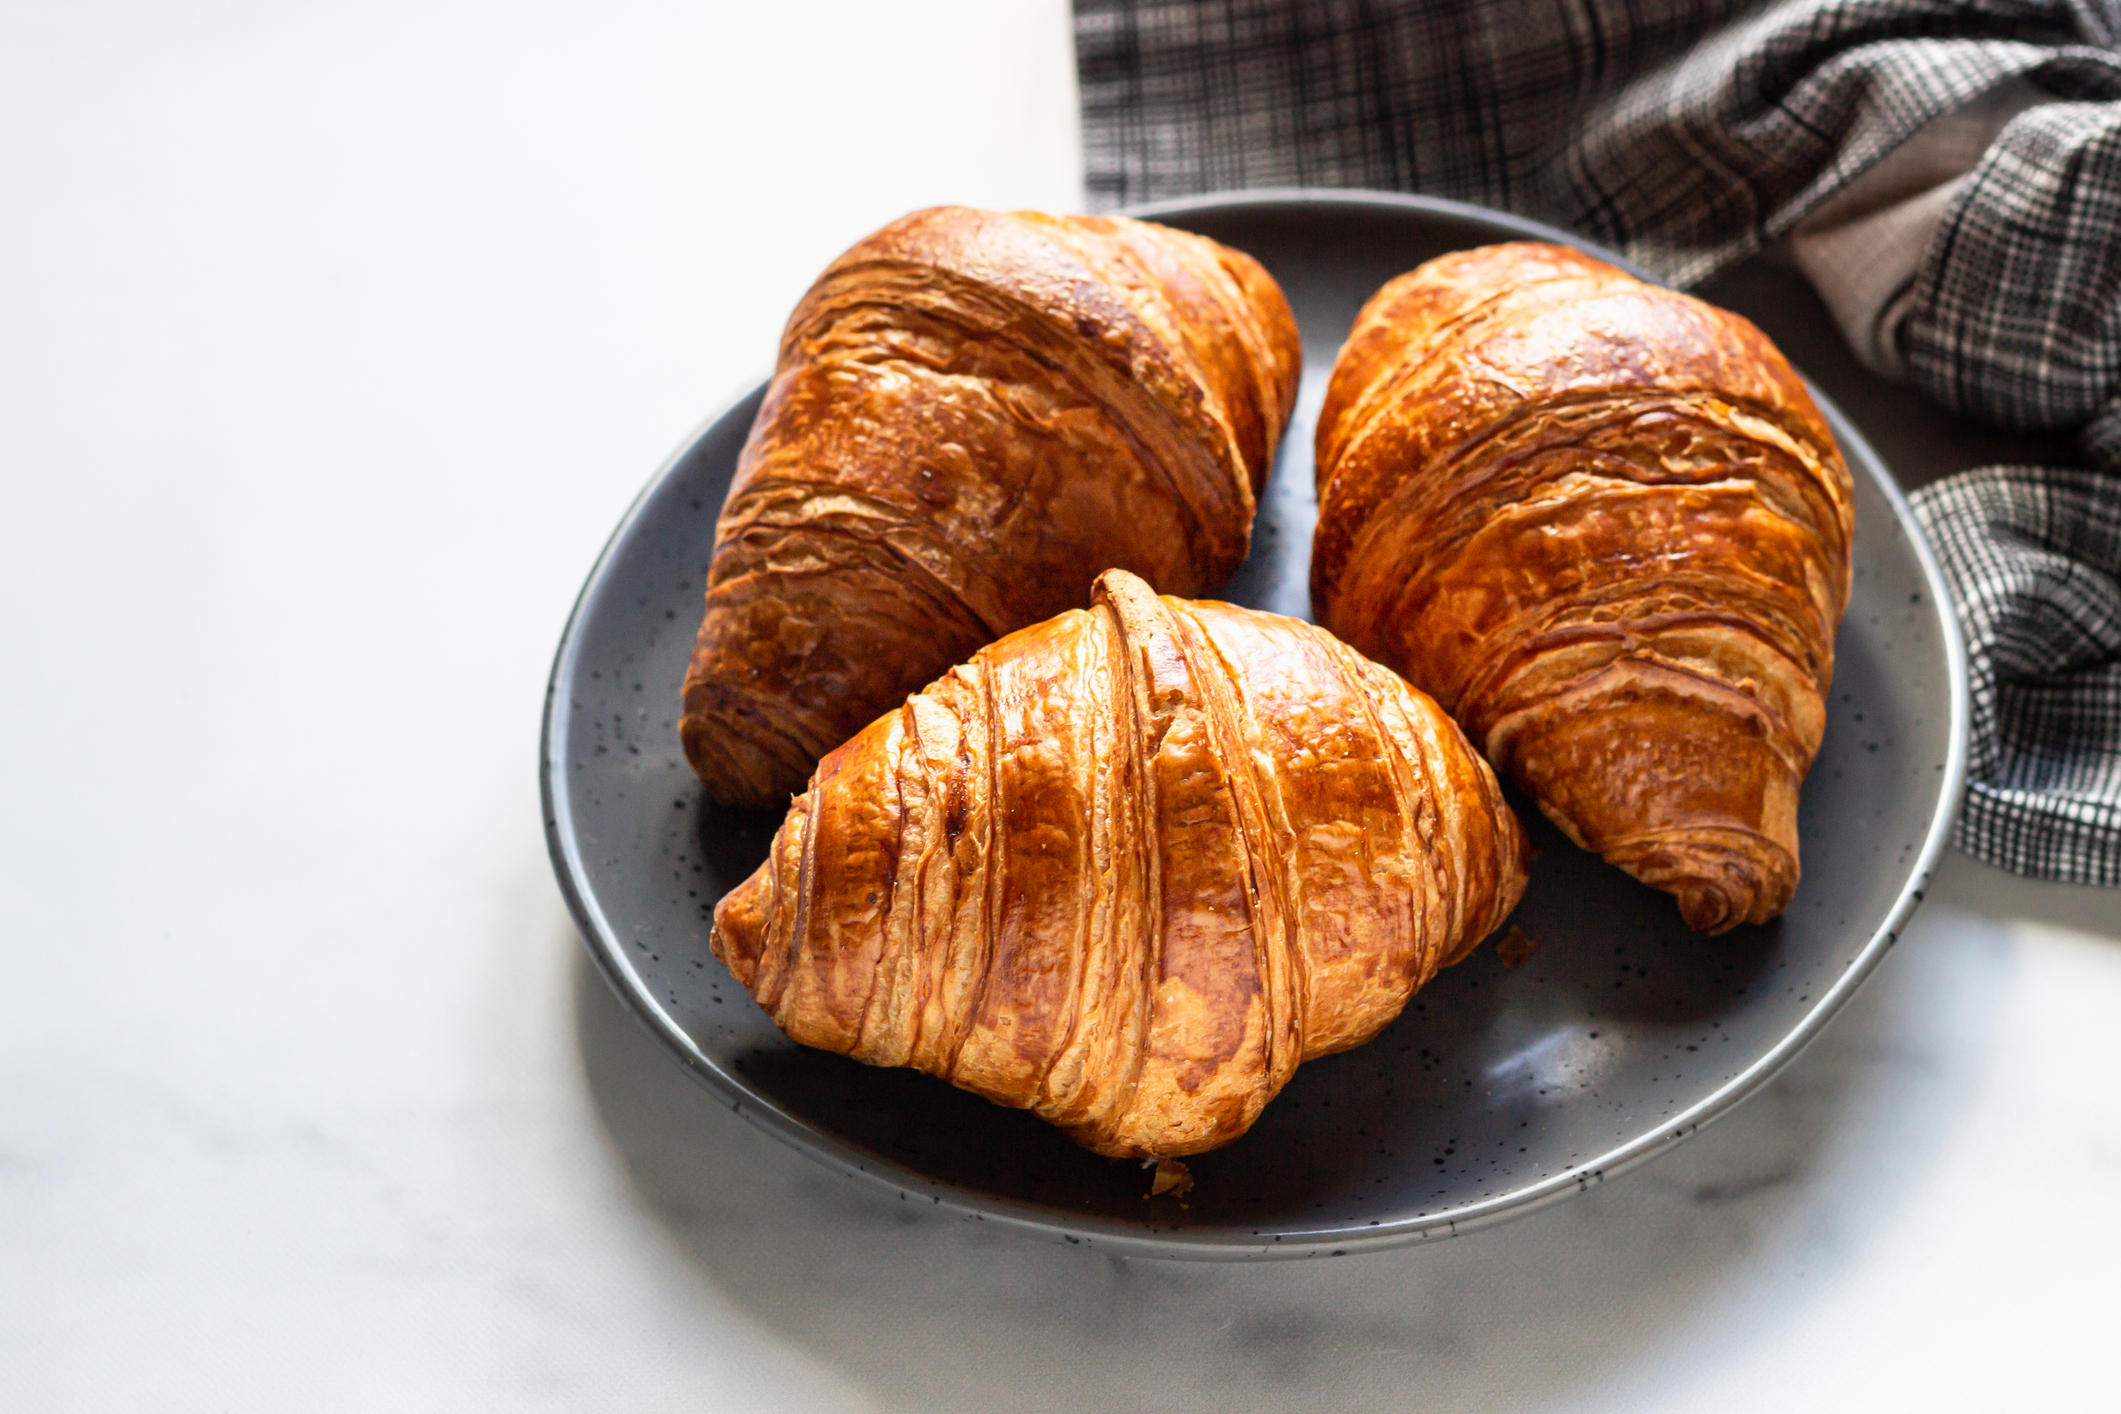 croissants de massa folhada num prato de barro cinza